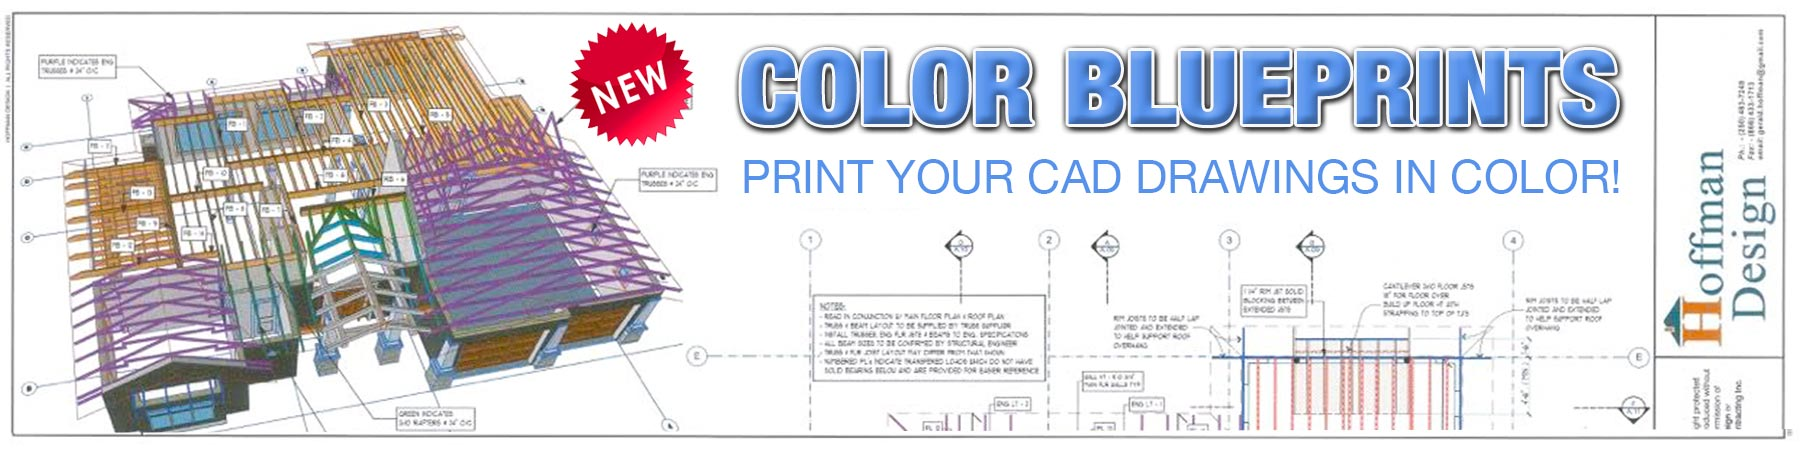 blueprint-printing-and-management.jpg